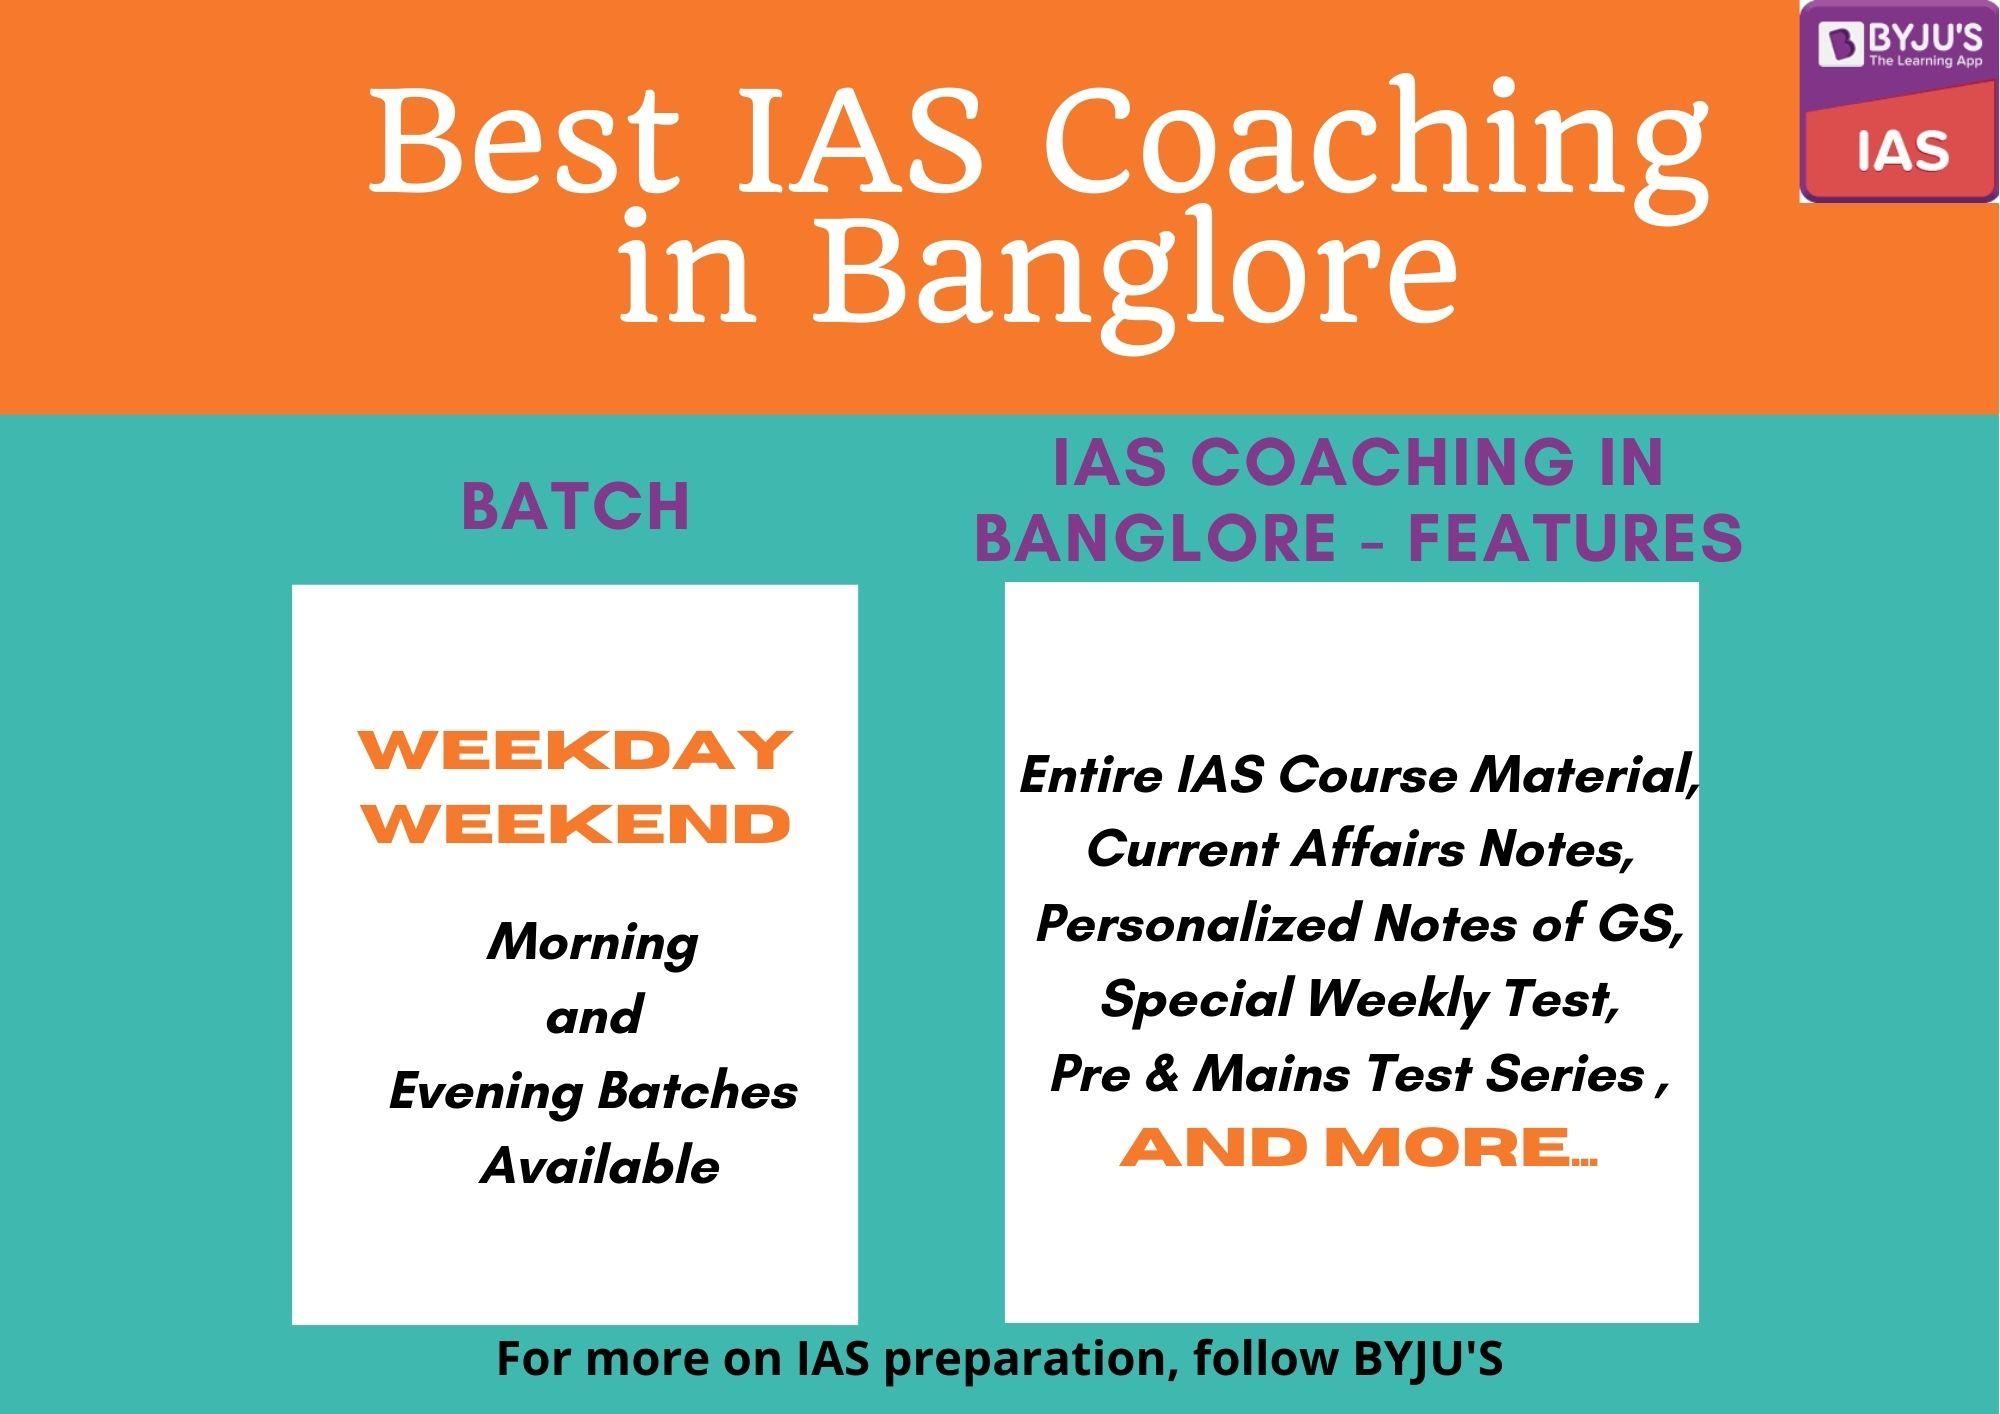 Best IAS Coaching in Banglore - UPSC Coaching in Banglore - BYJU'S